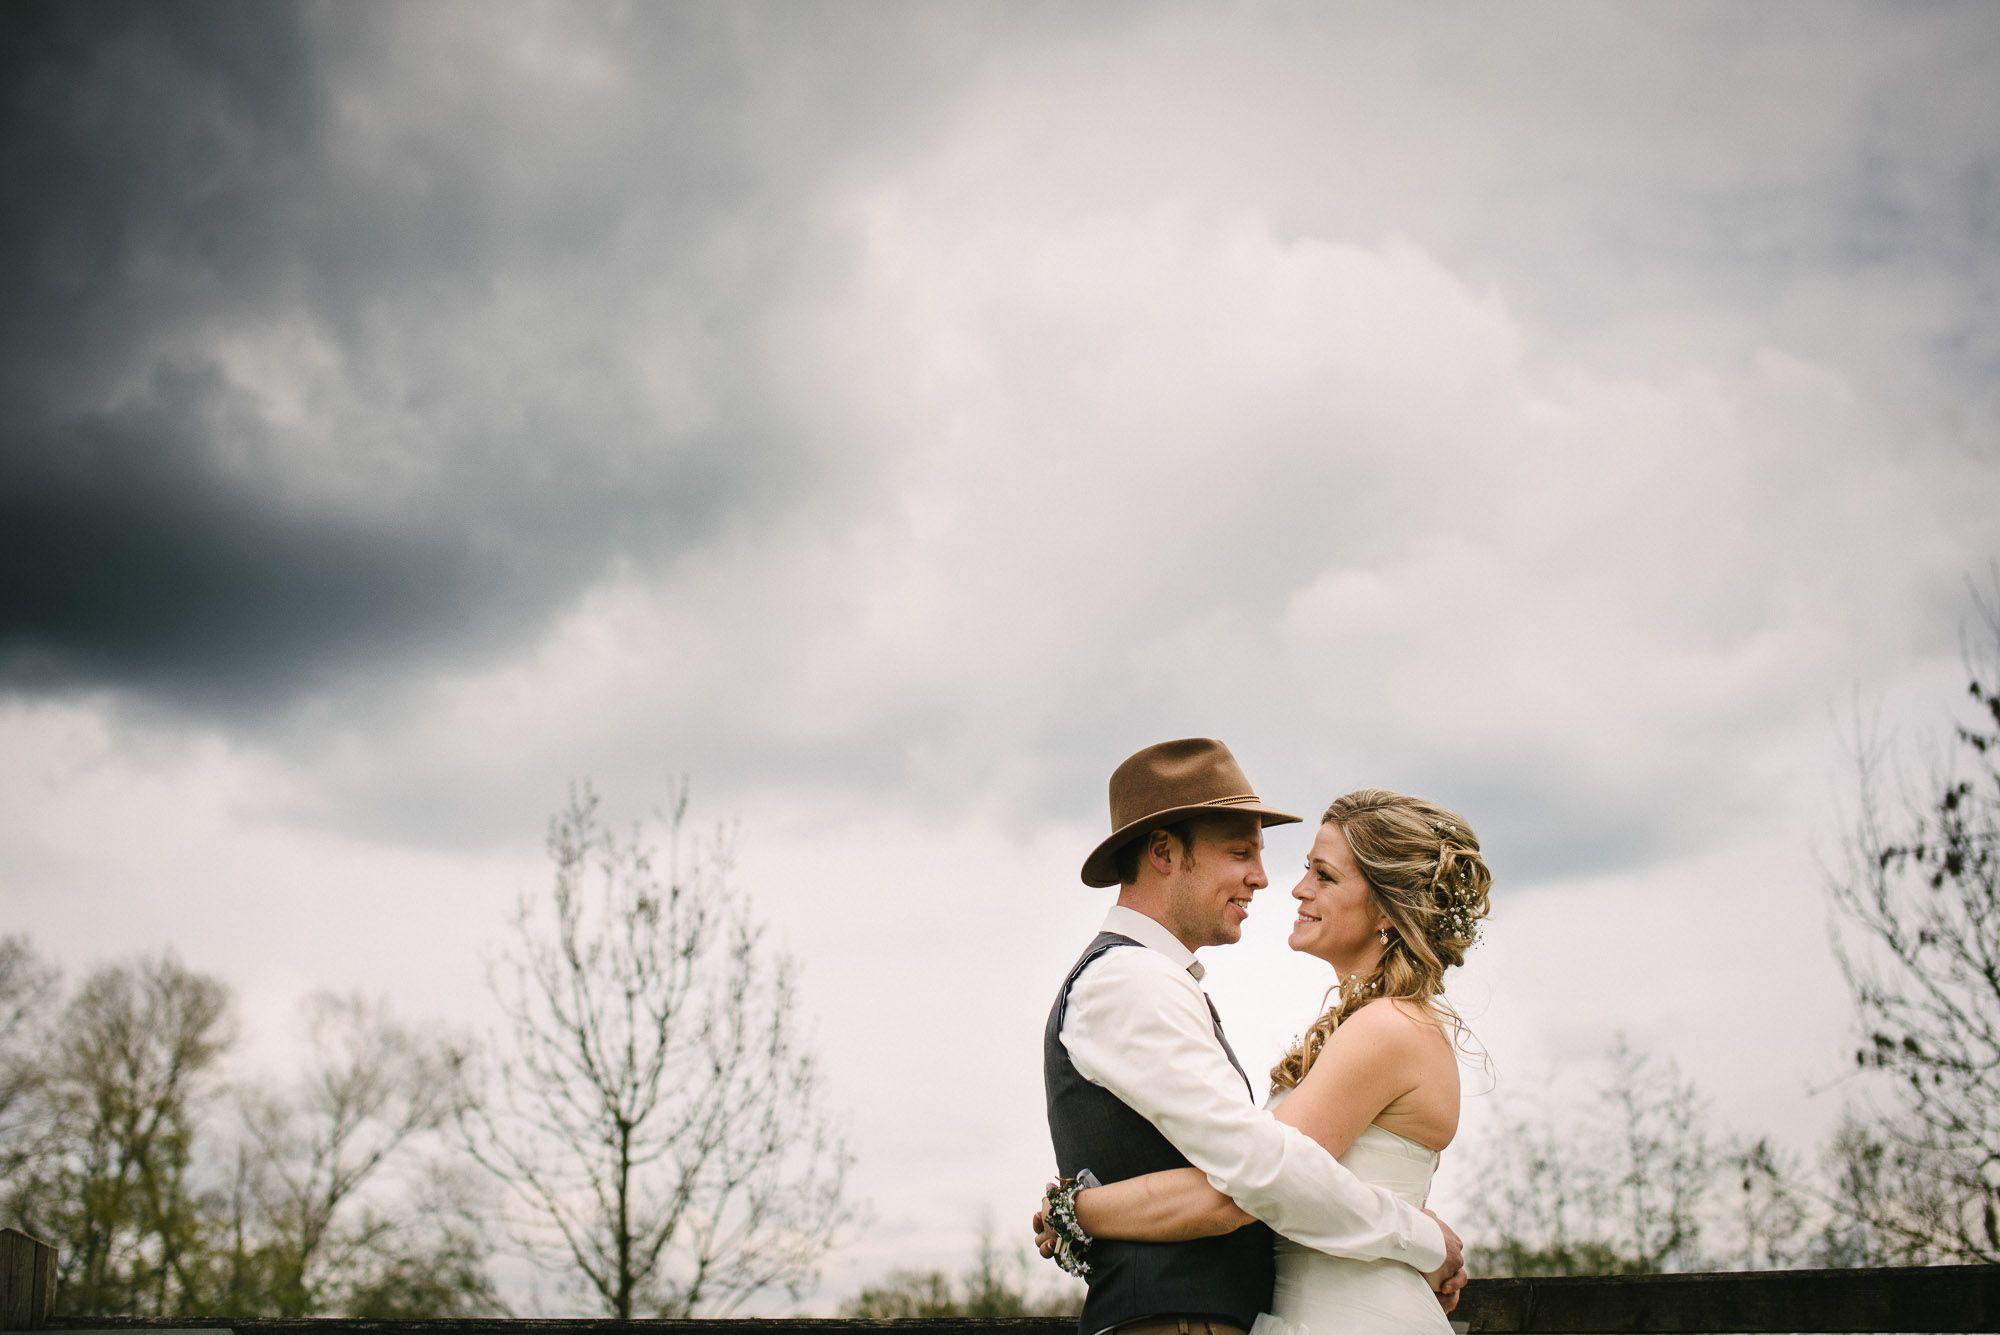 beste trouwfoto's